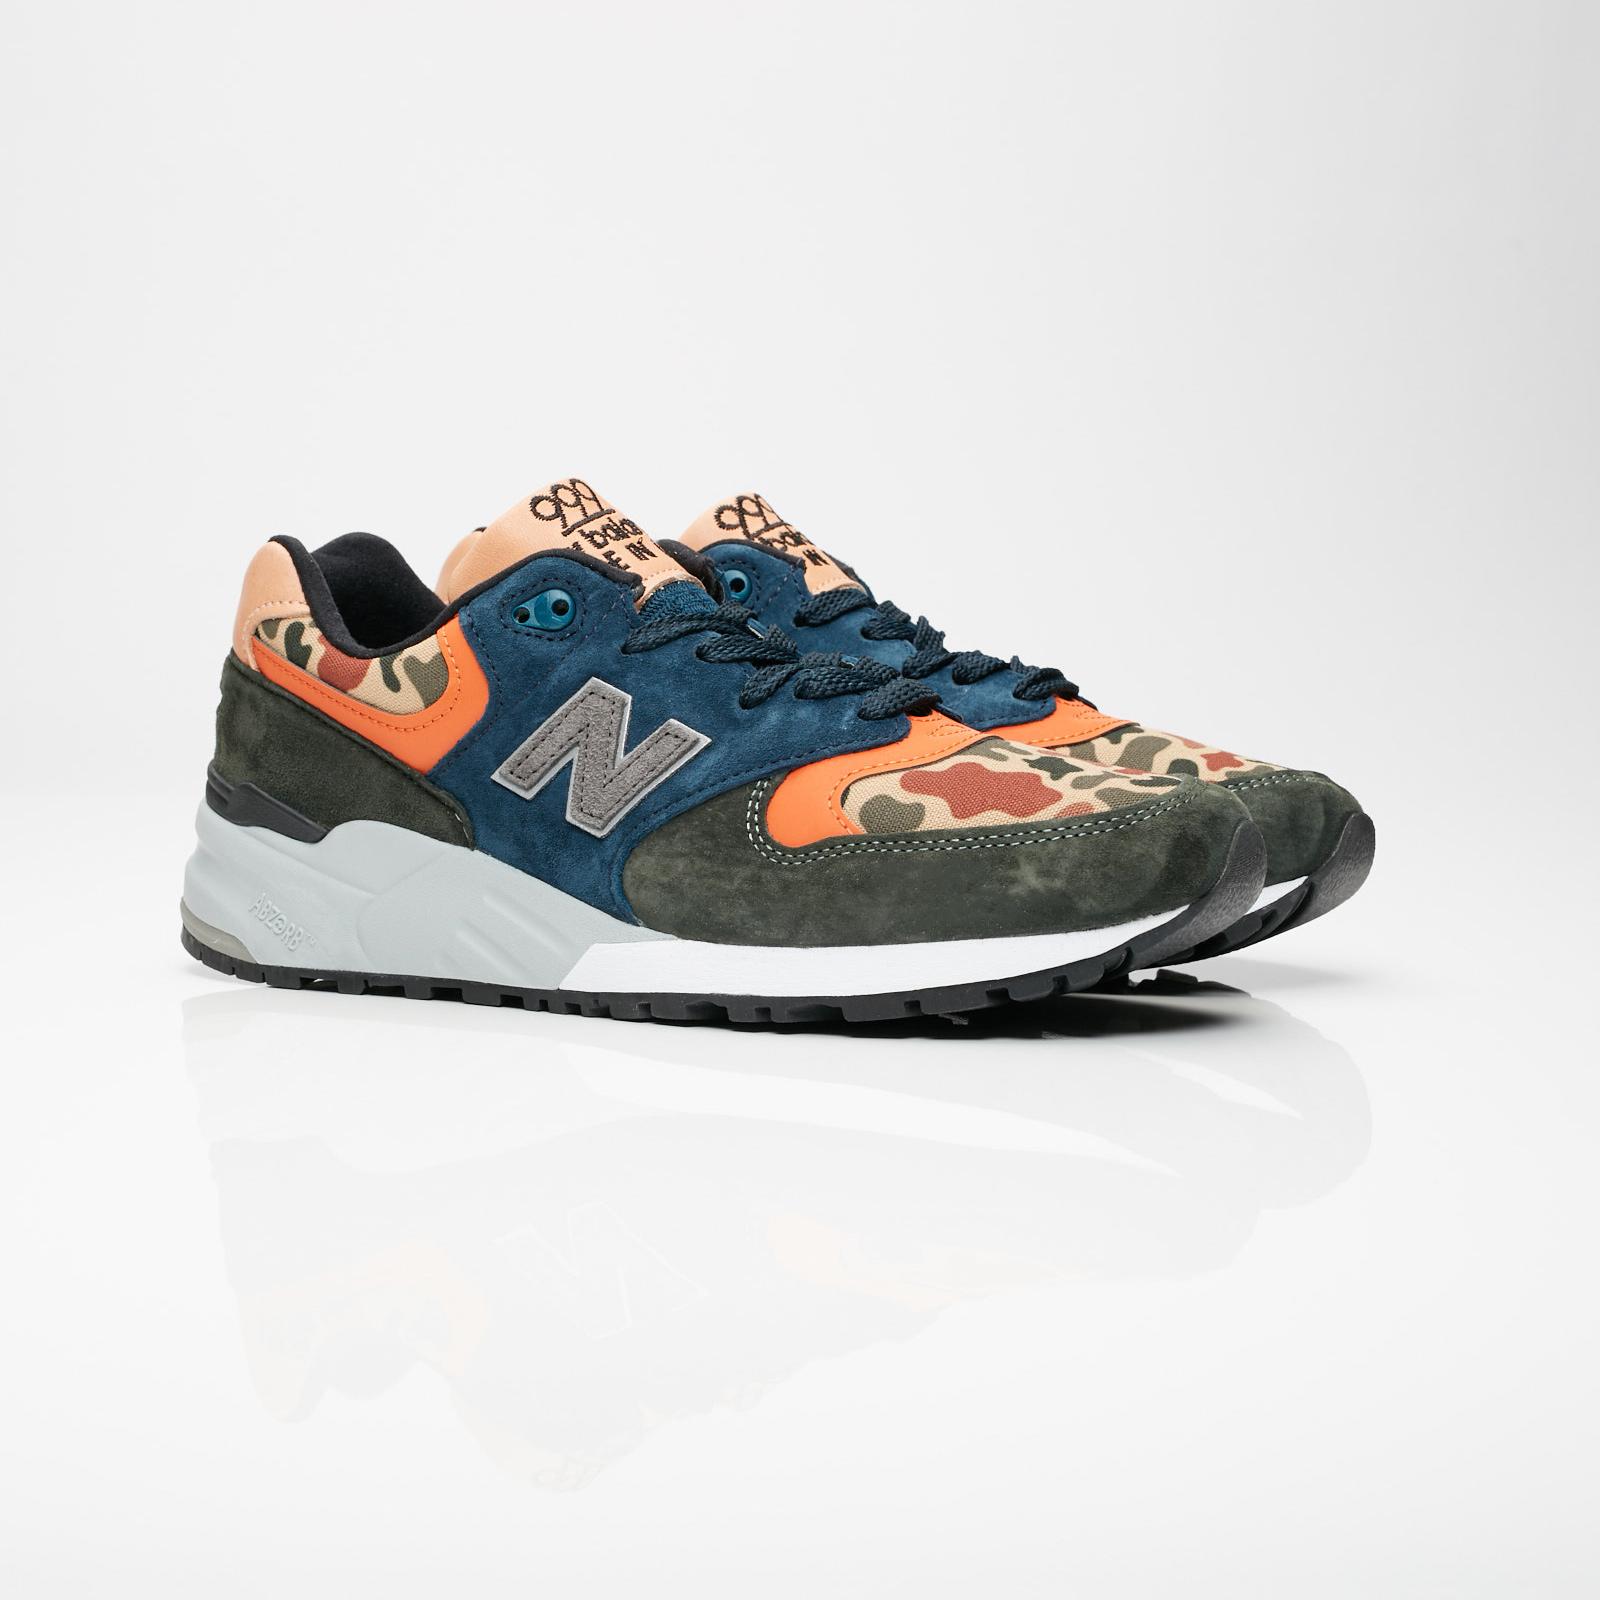 1b55c60bce7f9 New Balance M999 - M999ni - Sneakersnstuff | sneakers & streetwear ...